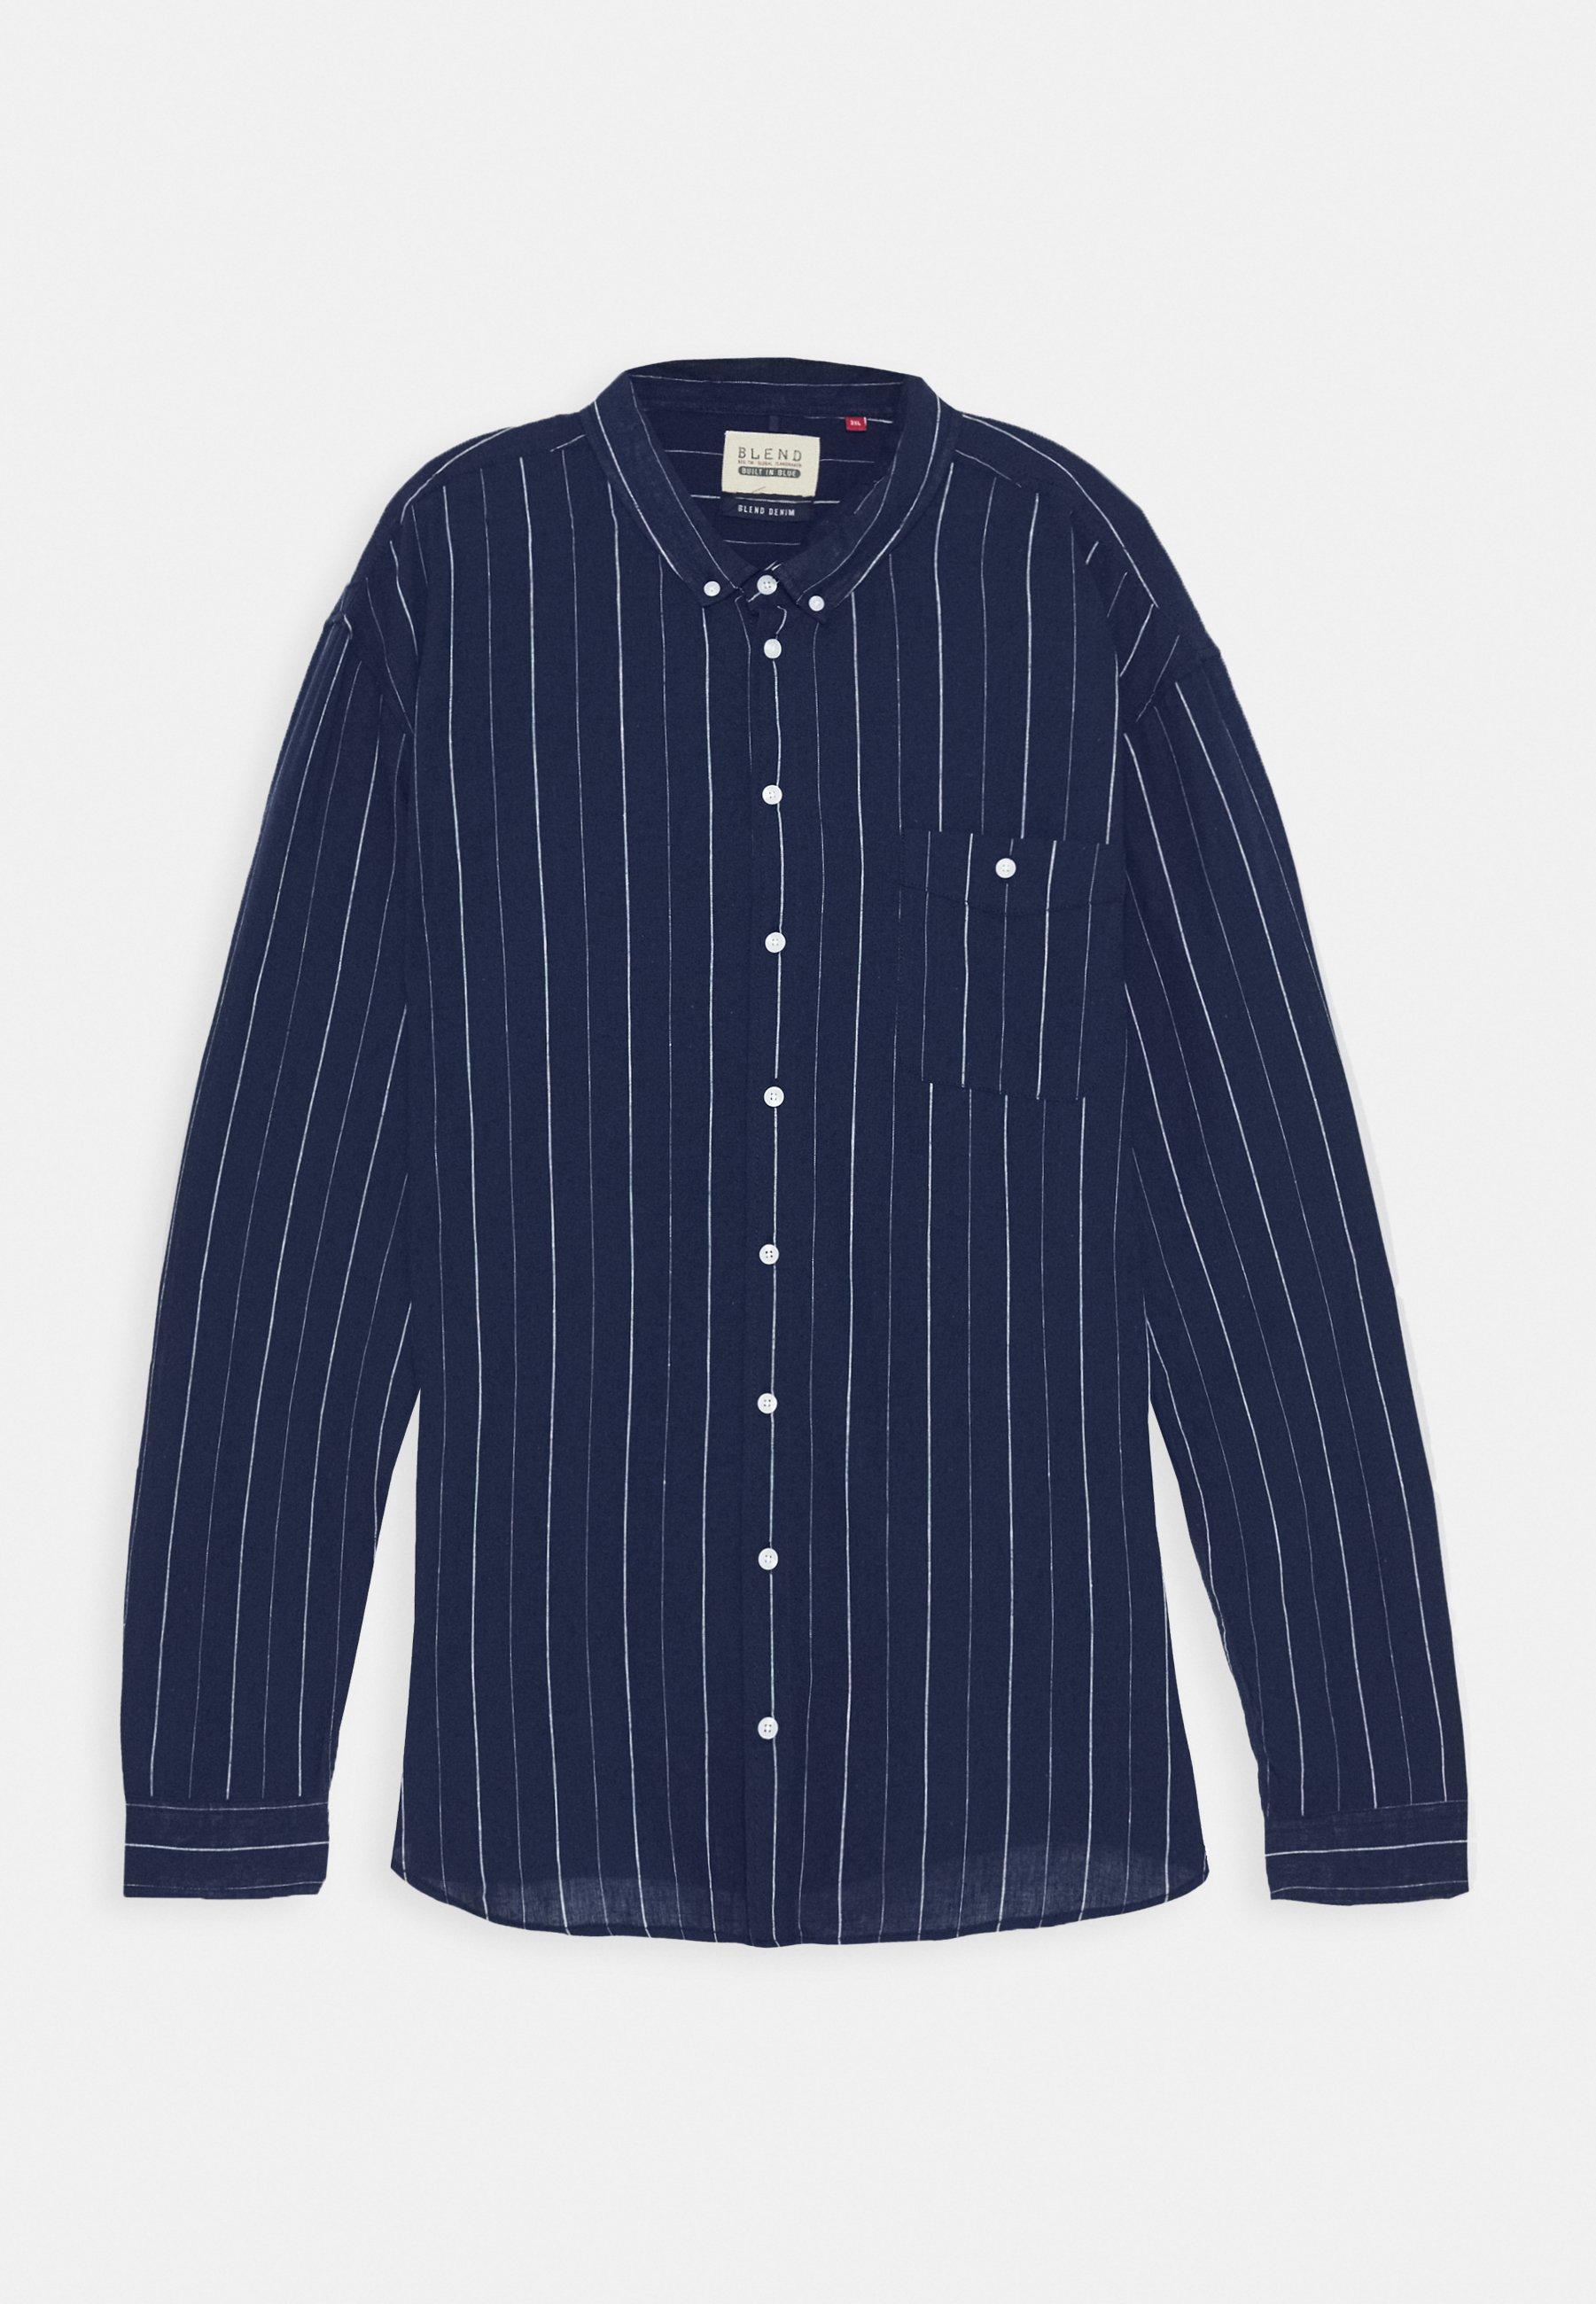 Blend Koszula - dark navy blue